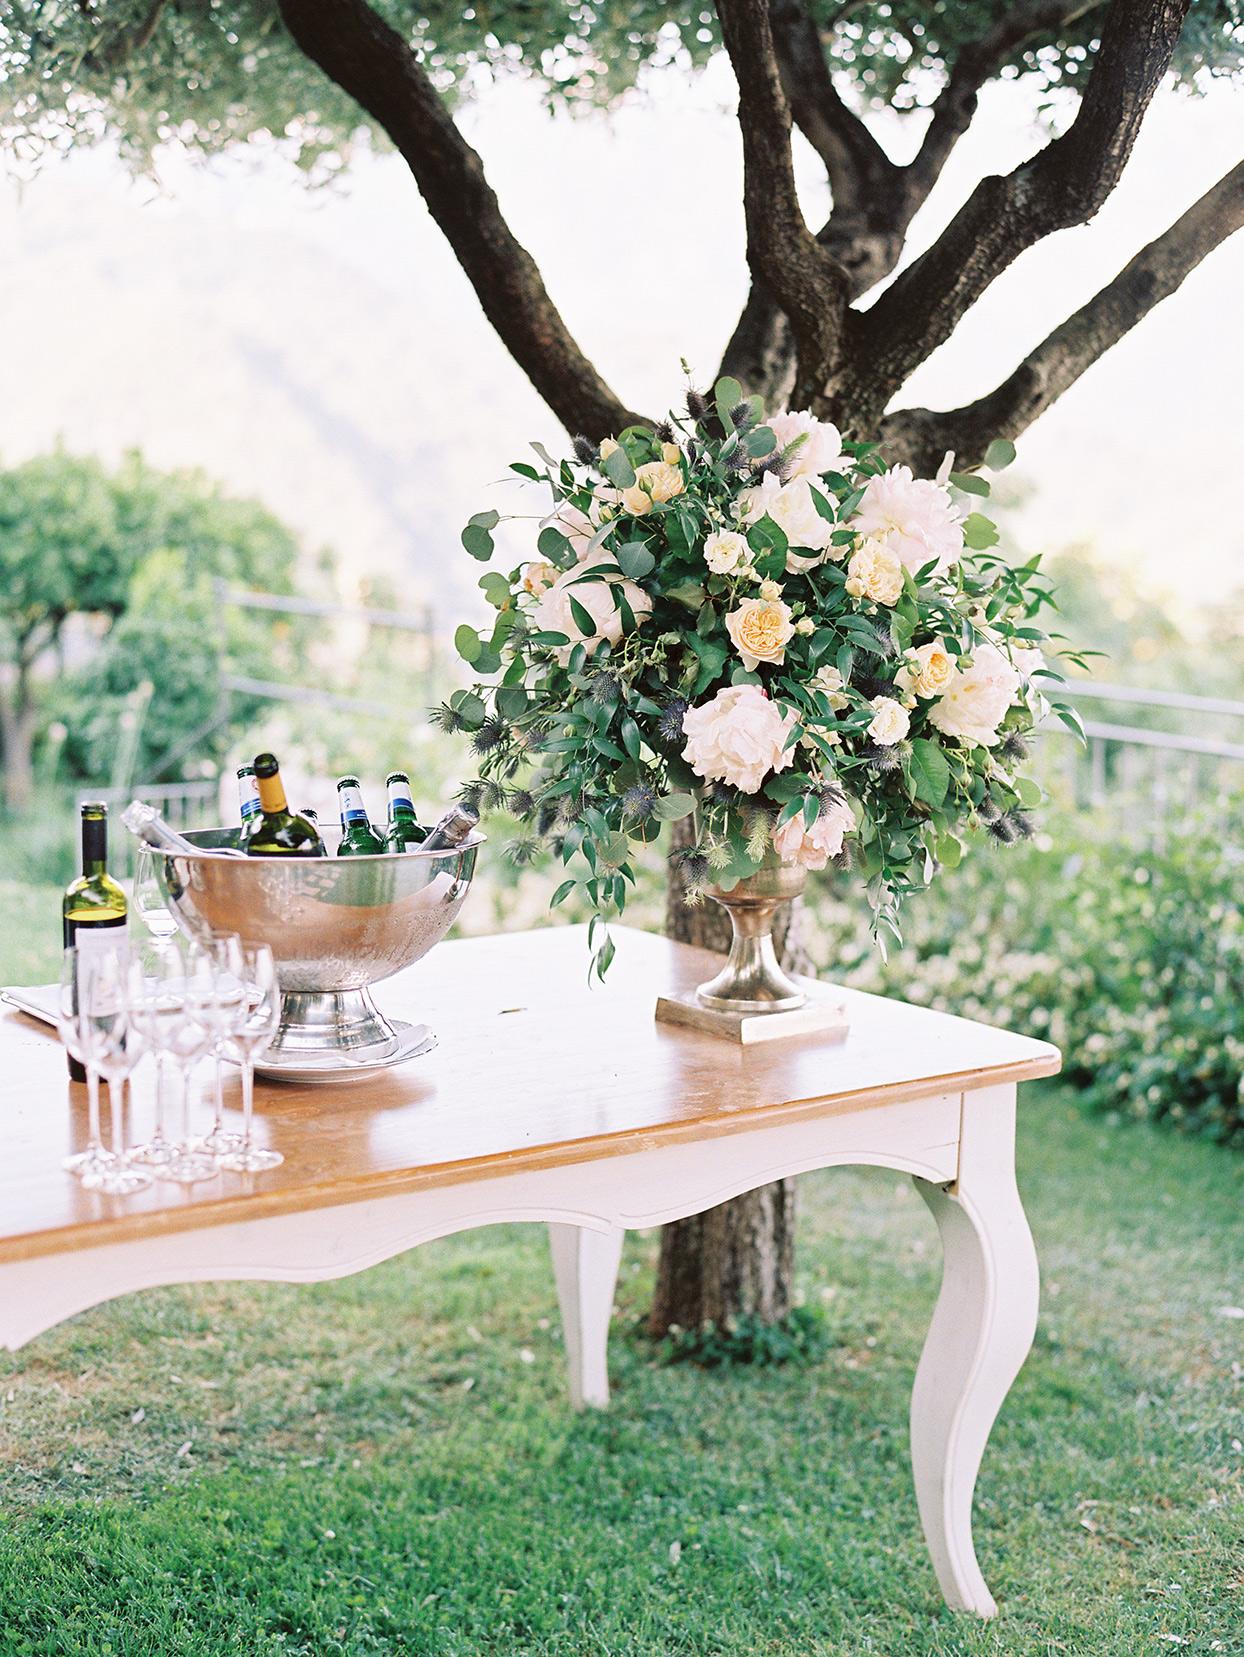 jacqueline david wedding cocktail hour setup